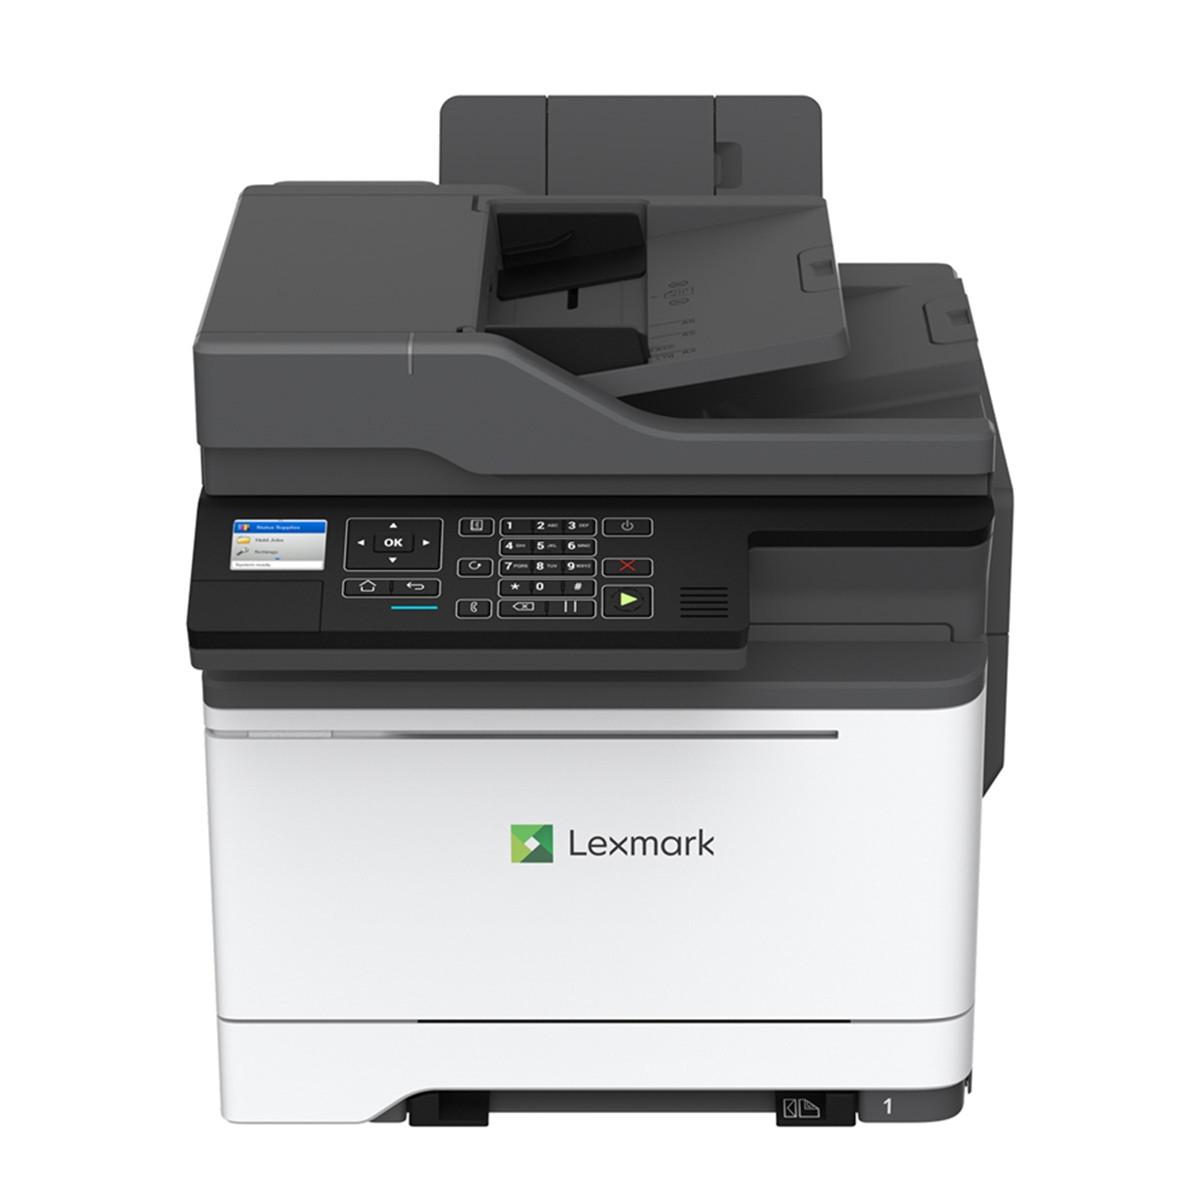 Impressora Lexmark CX421ADN CX421 | Multifuncional Laser Colorida com Duplex Rede